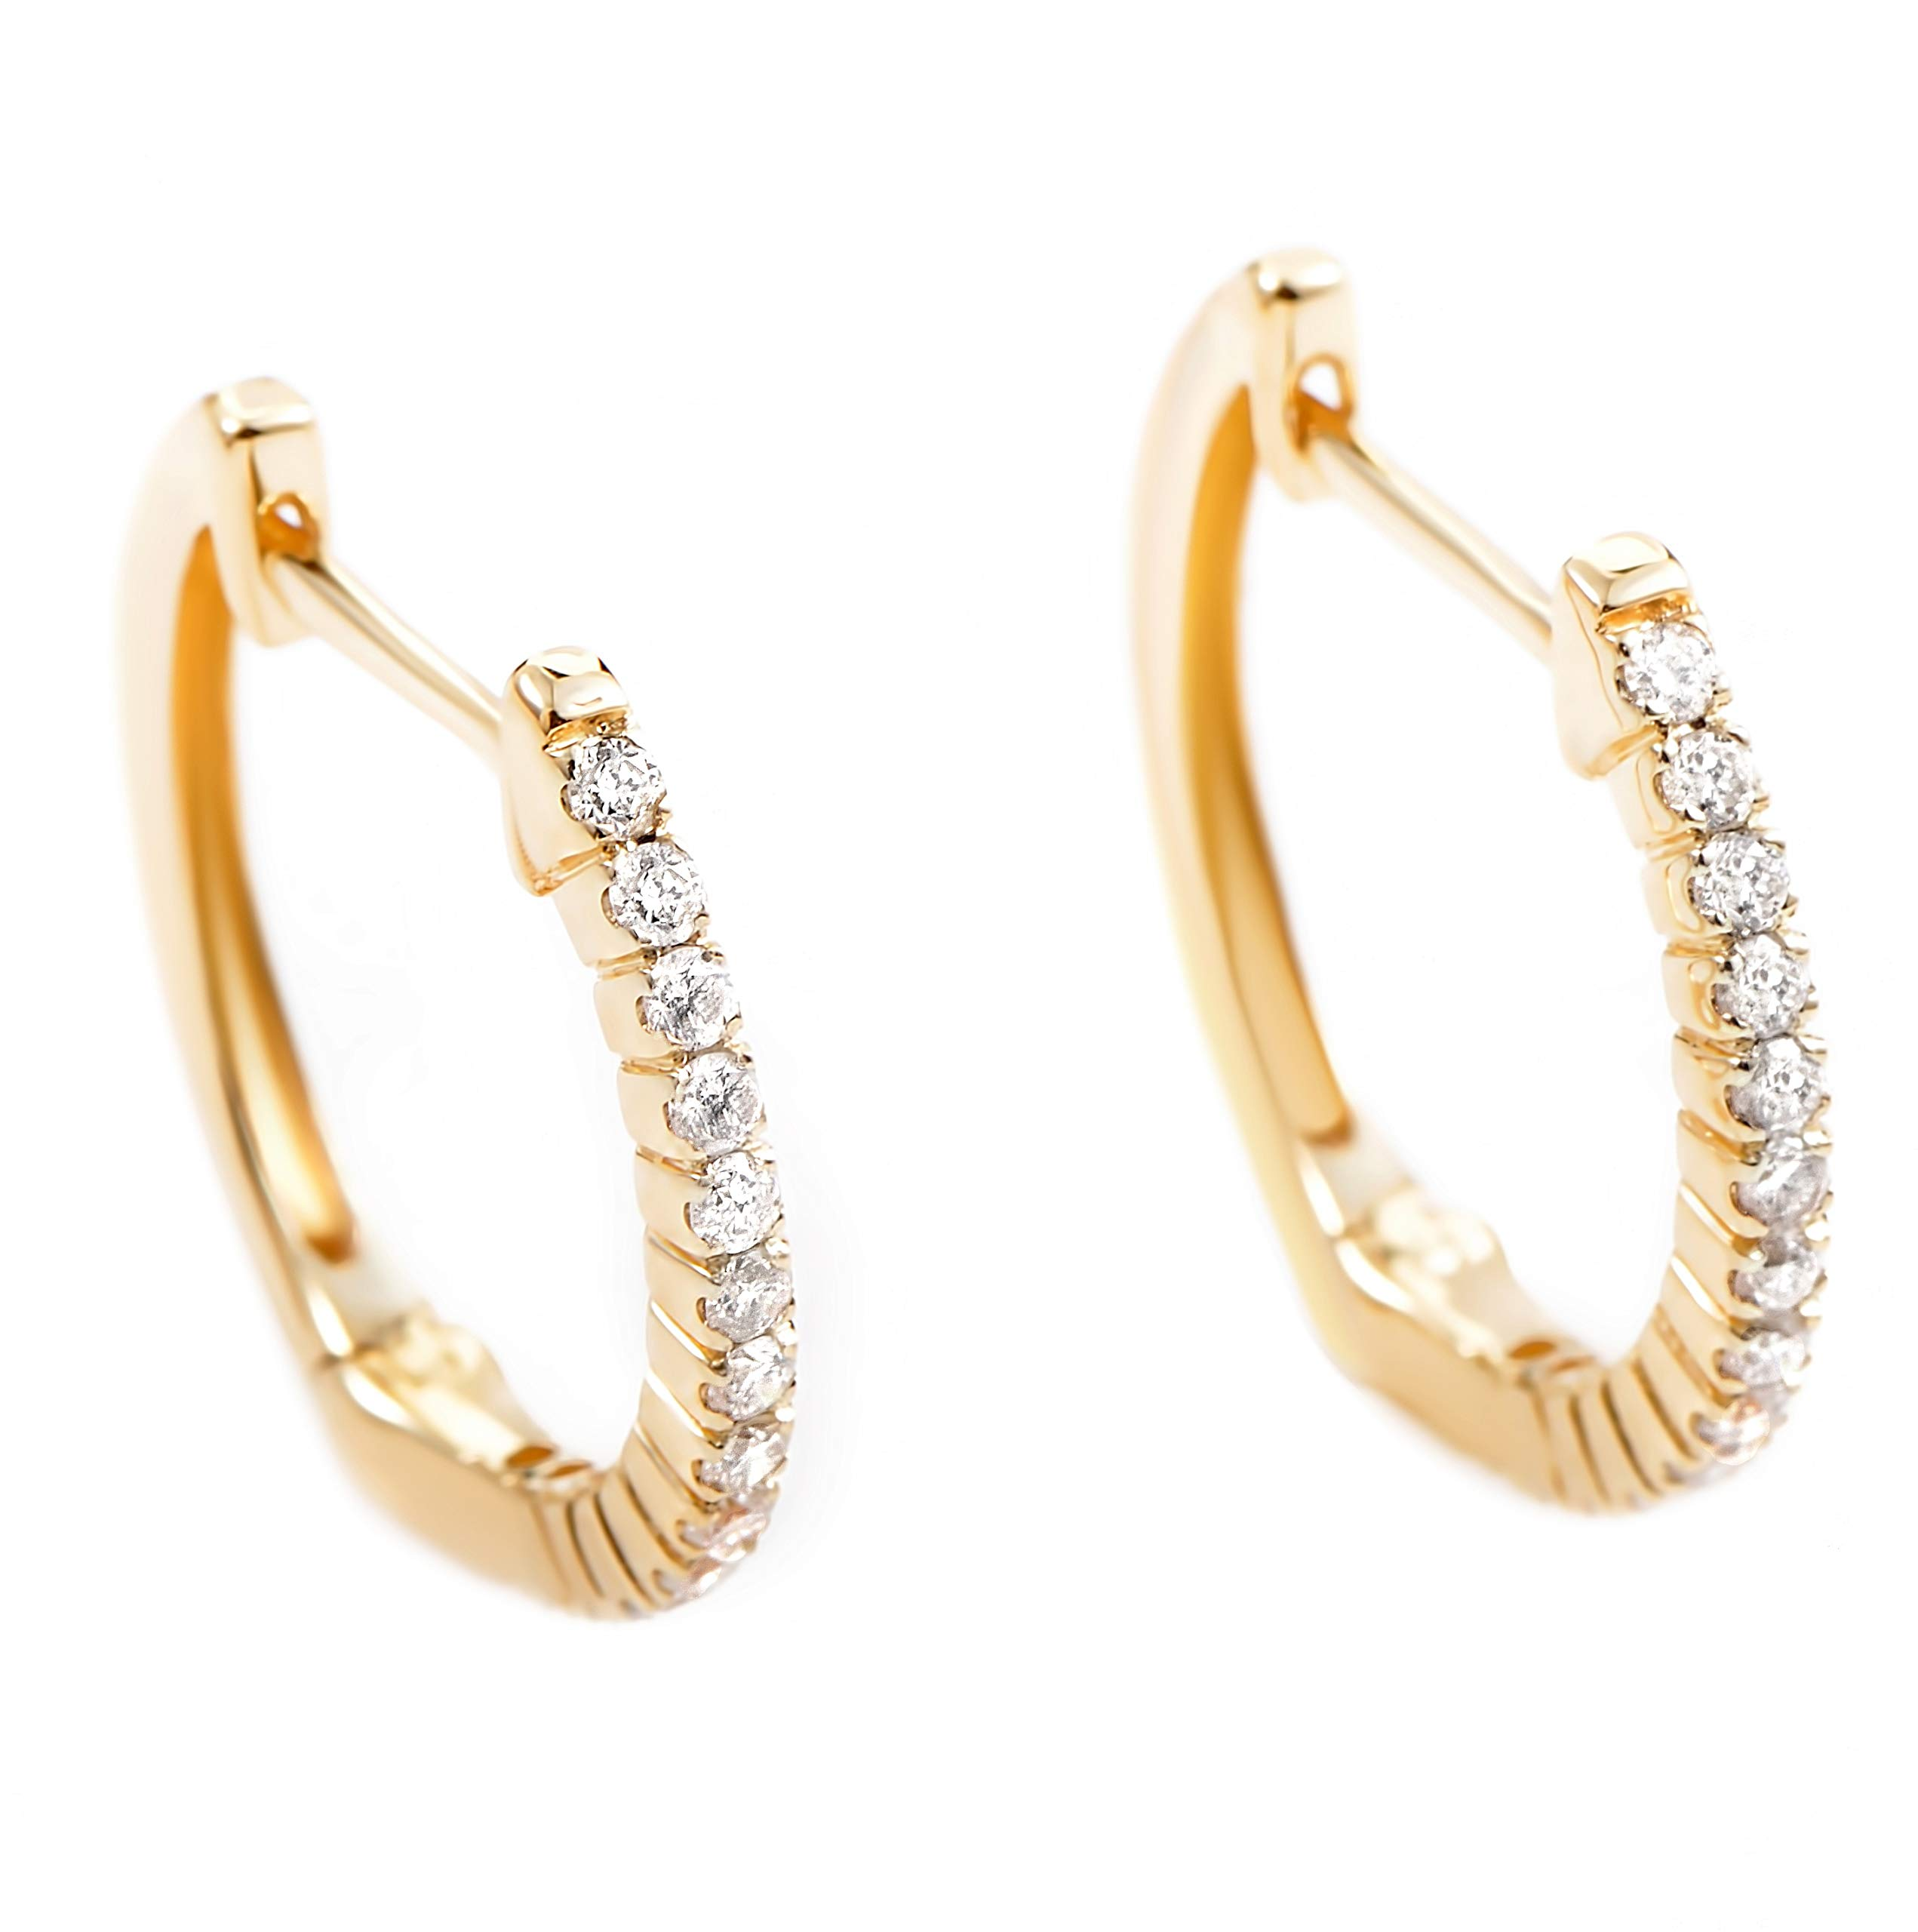 14K Yellow Gold Diamond Hoop Huggies Earrings .27 Carat (0.27 ctw) Brilliant Diamonds by Luxury Bazaar